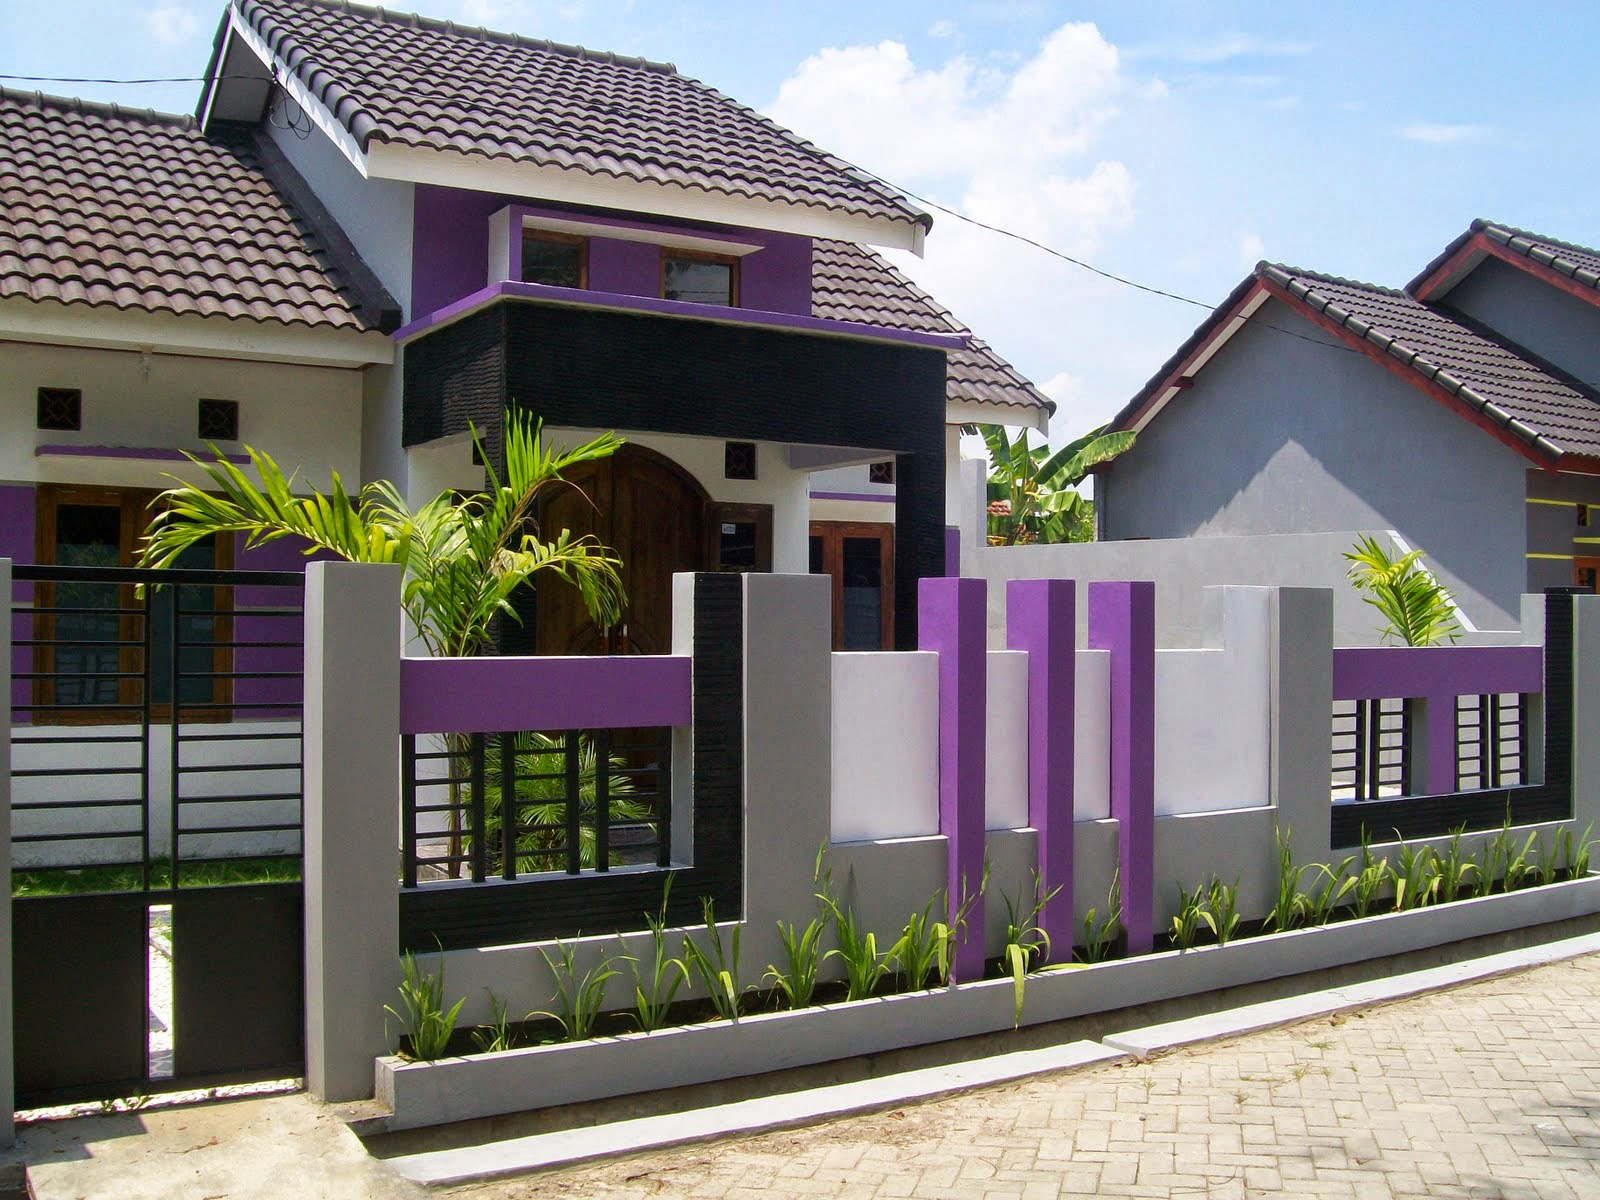 Home-to-Home-Fence-Minimalist-Modern